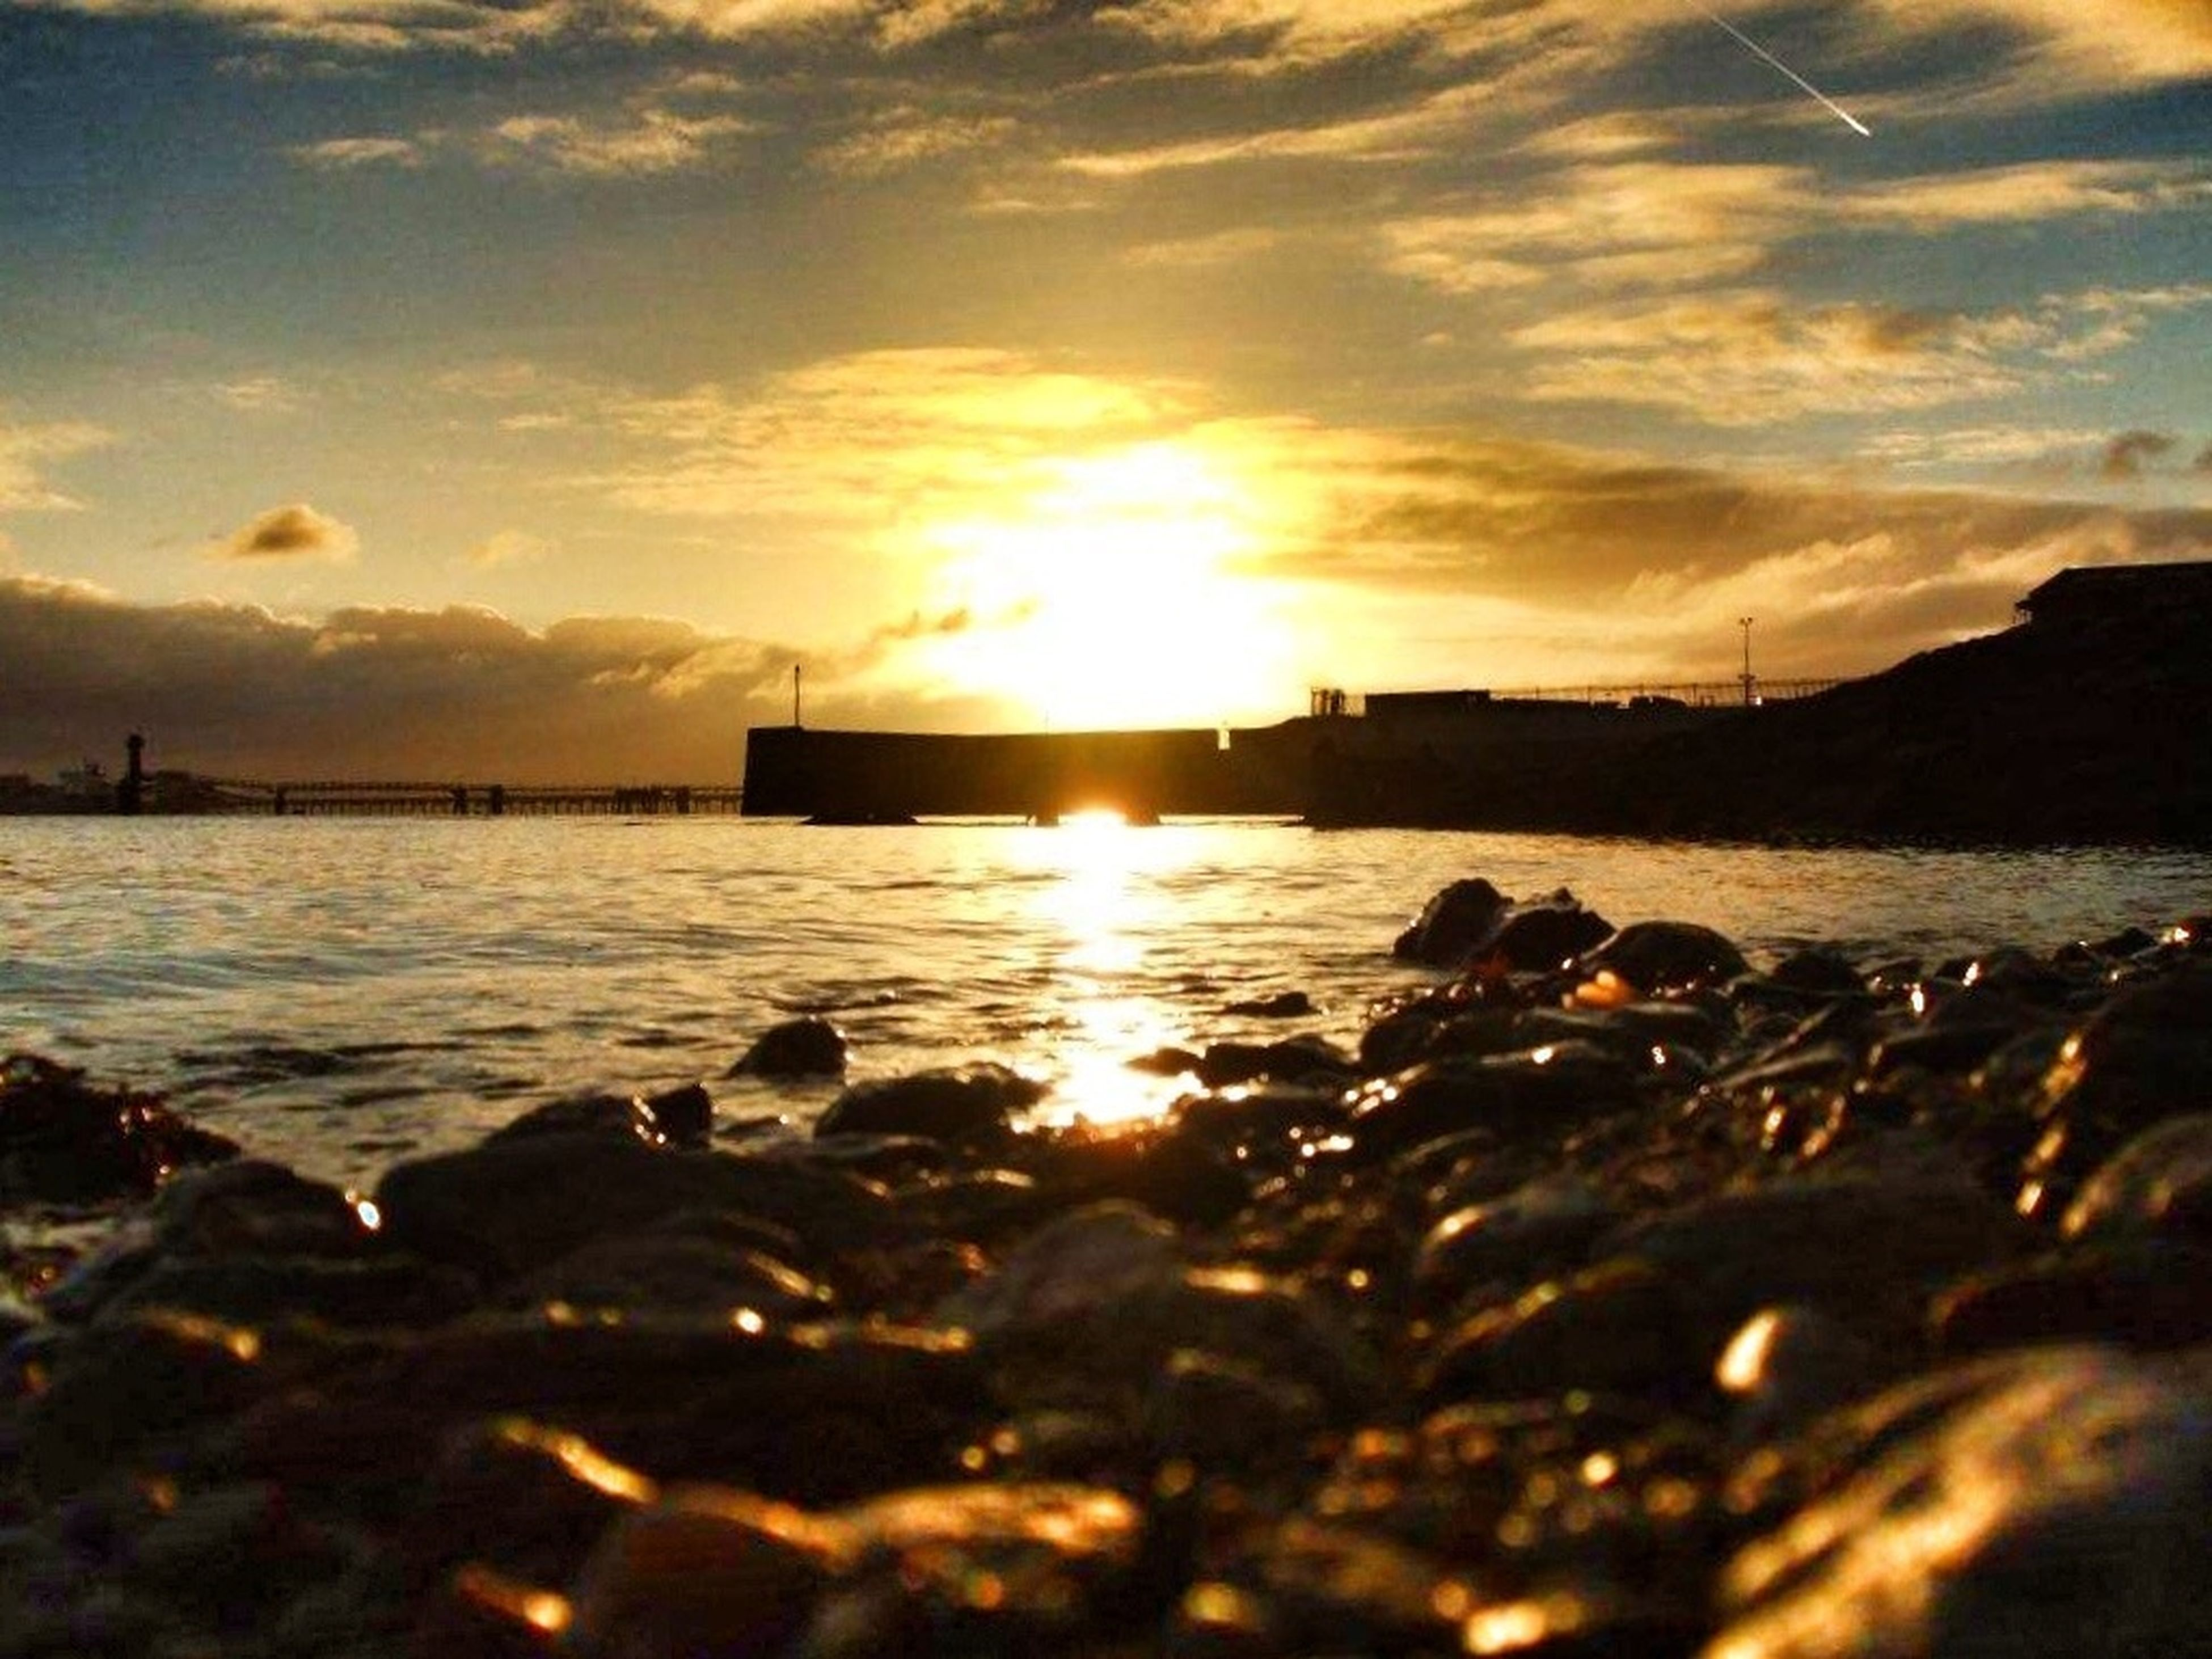 sunset, water, sky, sea, beach, scenics, tranquil scene, beauty in nature, shore, tranquility, cloud - sky, nature, sun, reflection, idyllic, rock - object, orange color, sunlight, silhouette, cloud